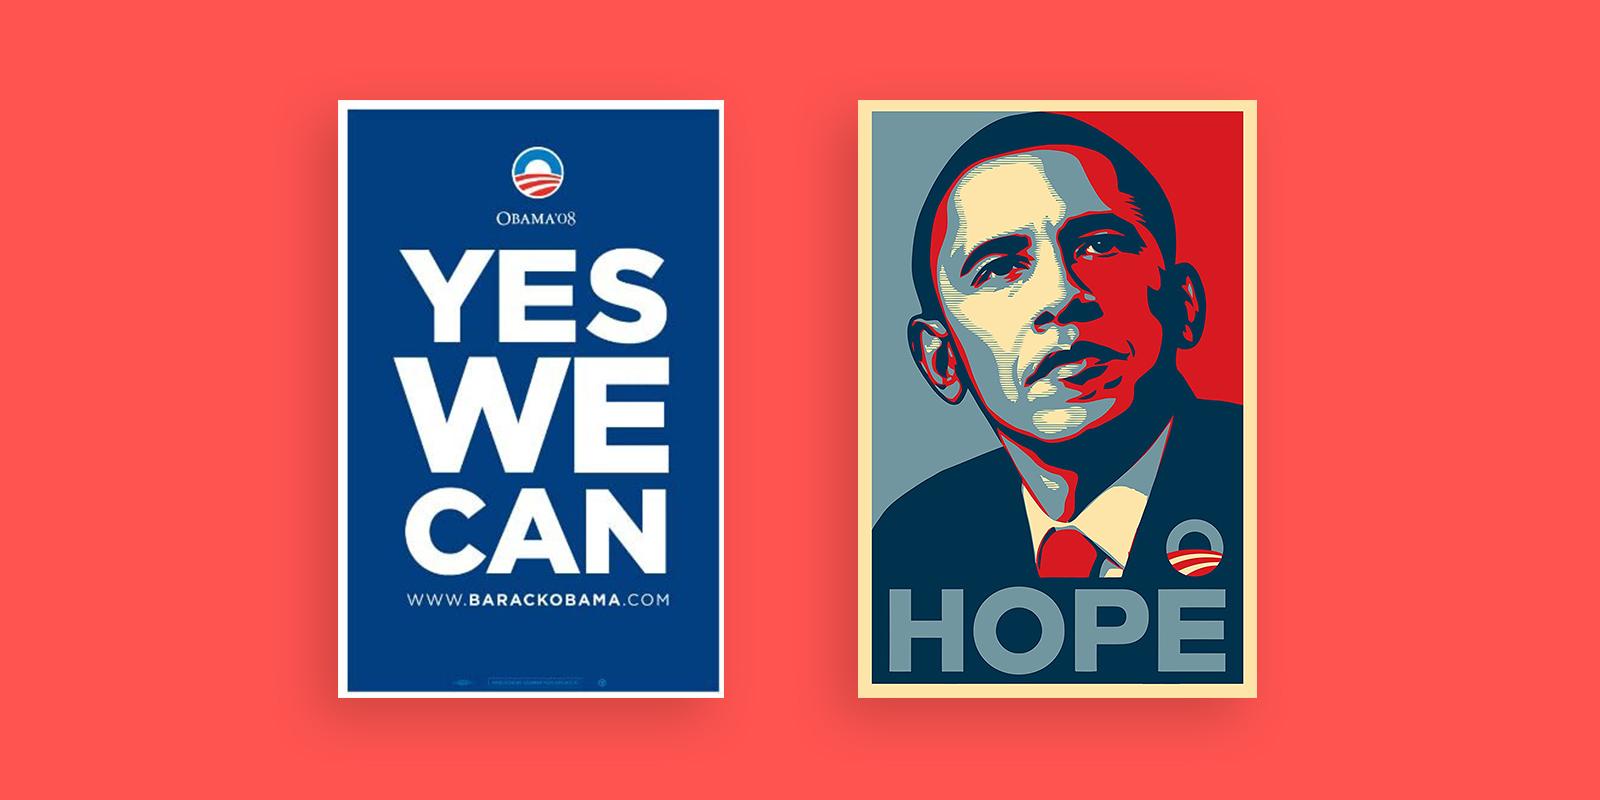 Gotham Barack Obama Yes We Can Poster Design